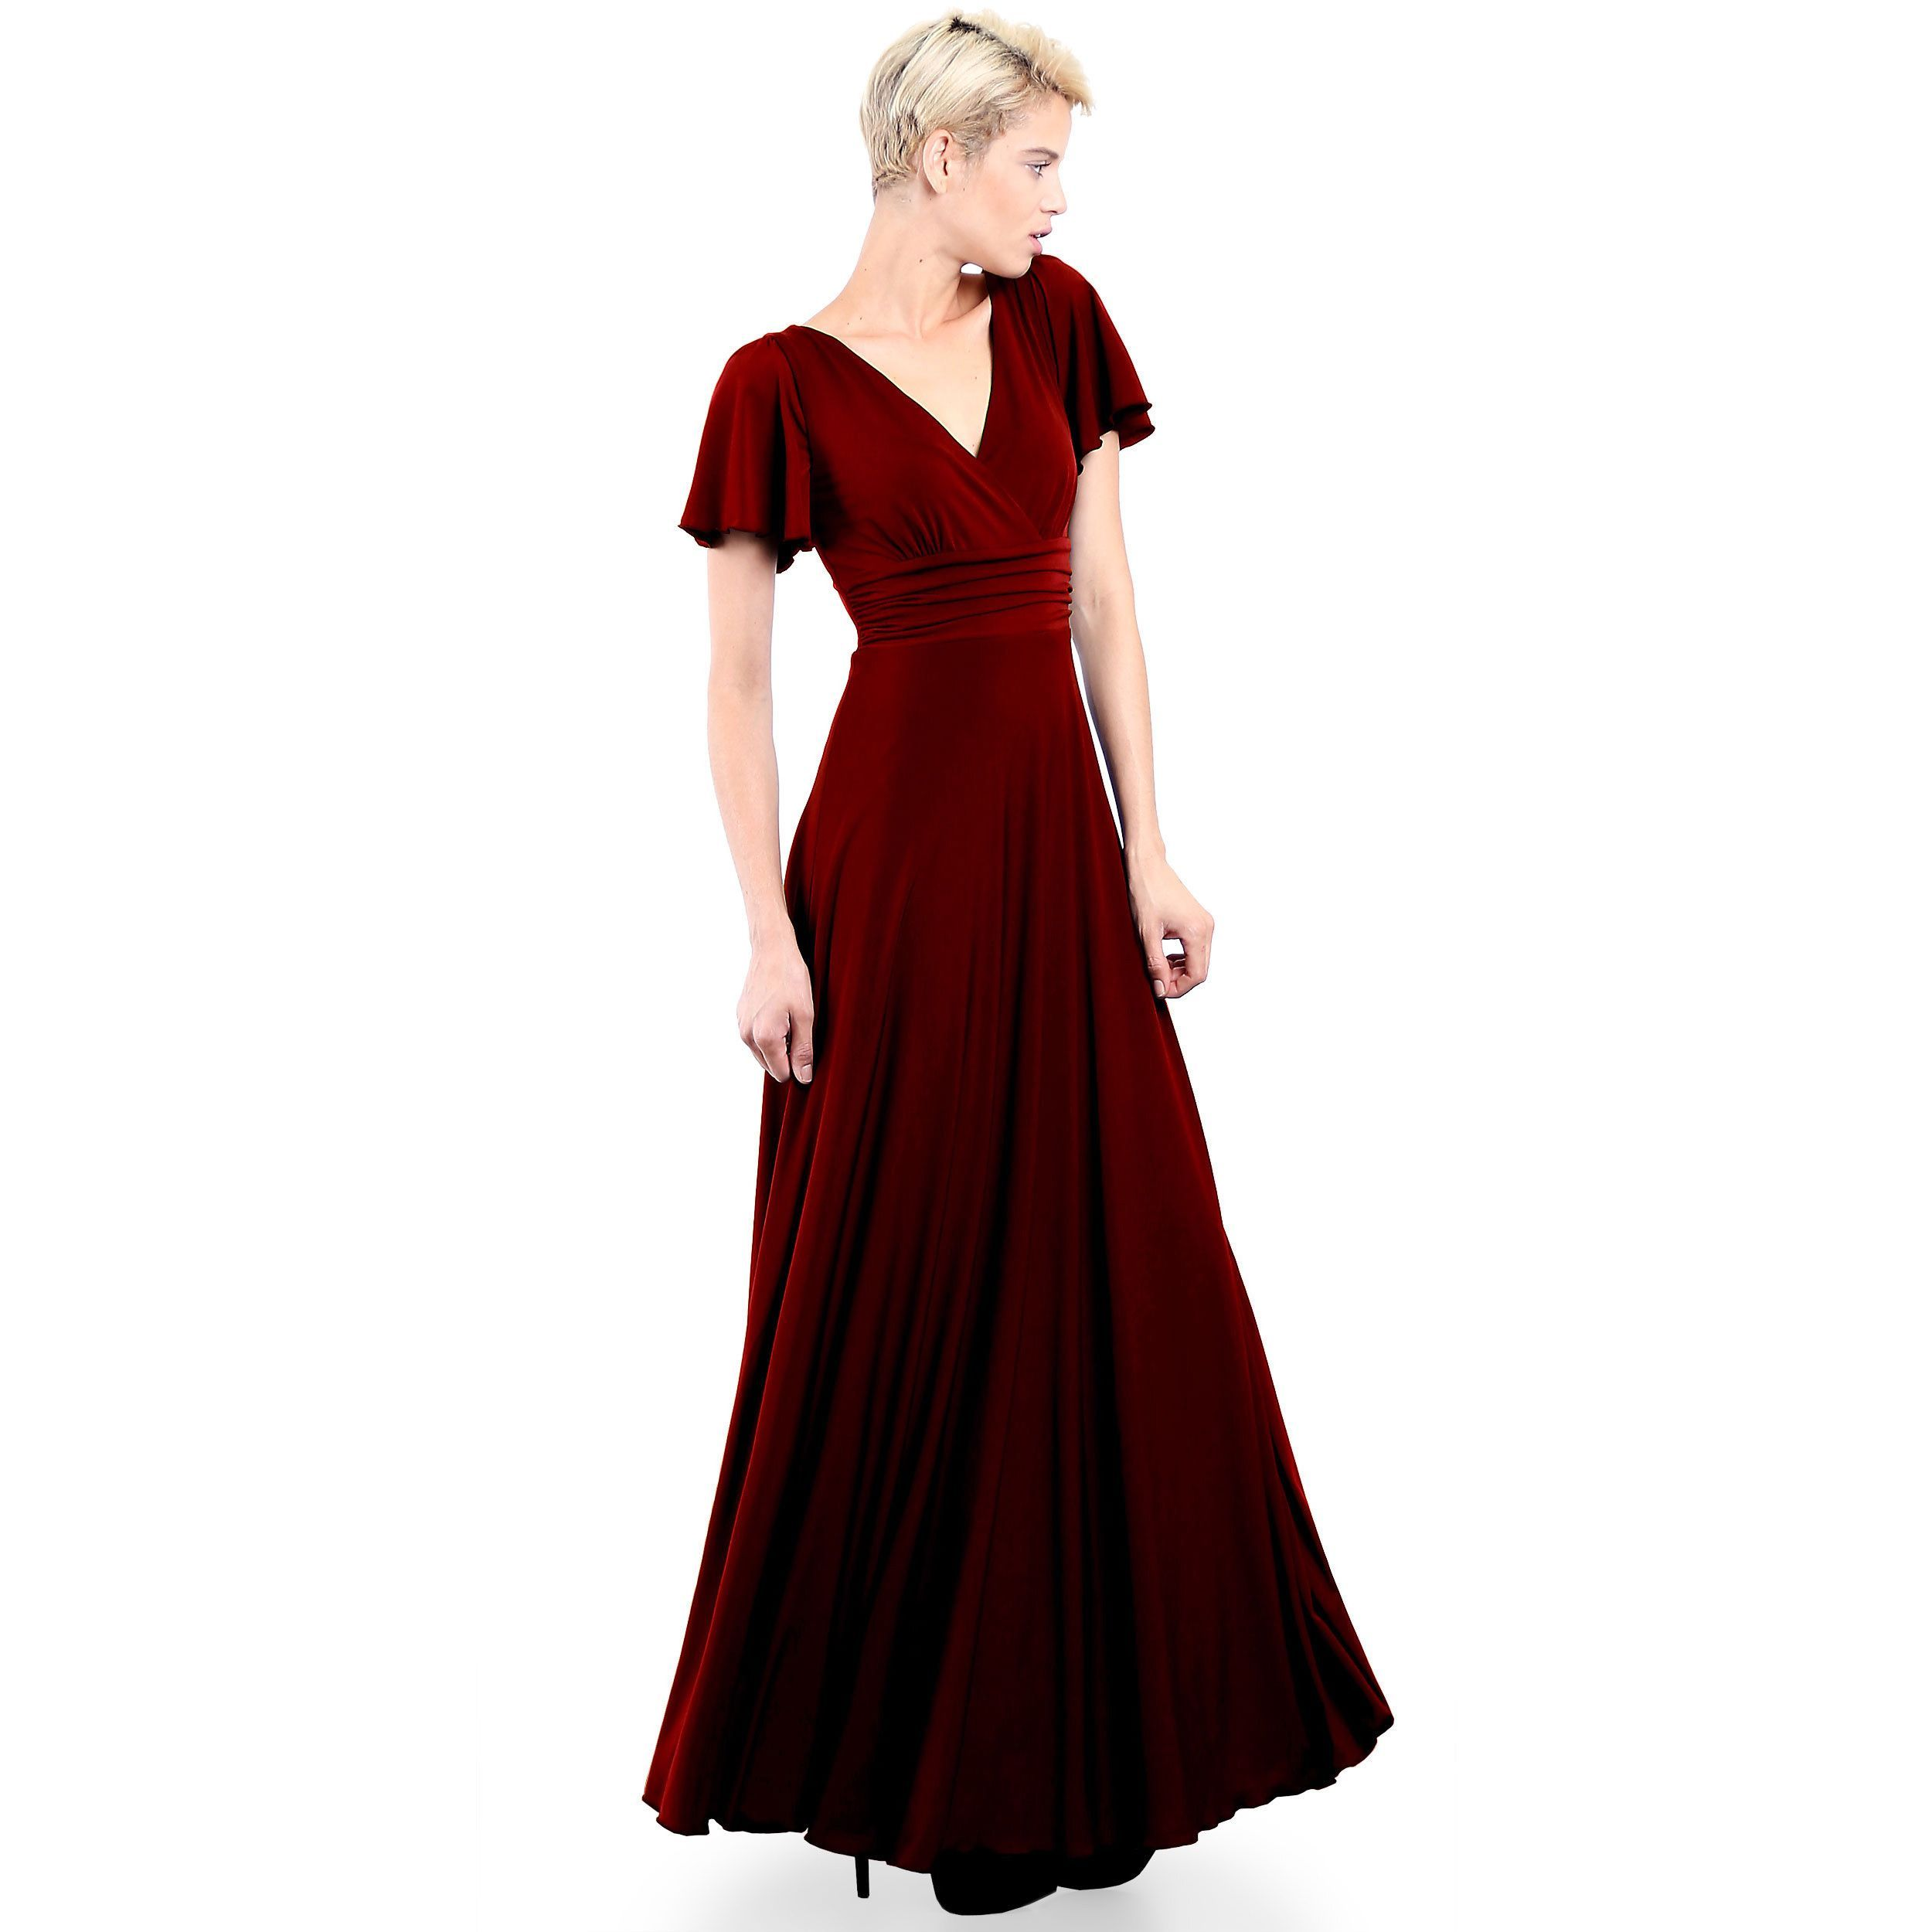 Evanese womenus elegant slipon long formal evening party dress with